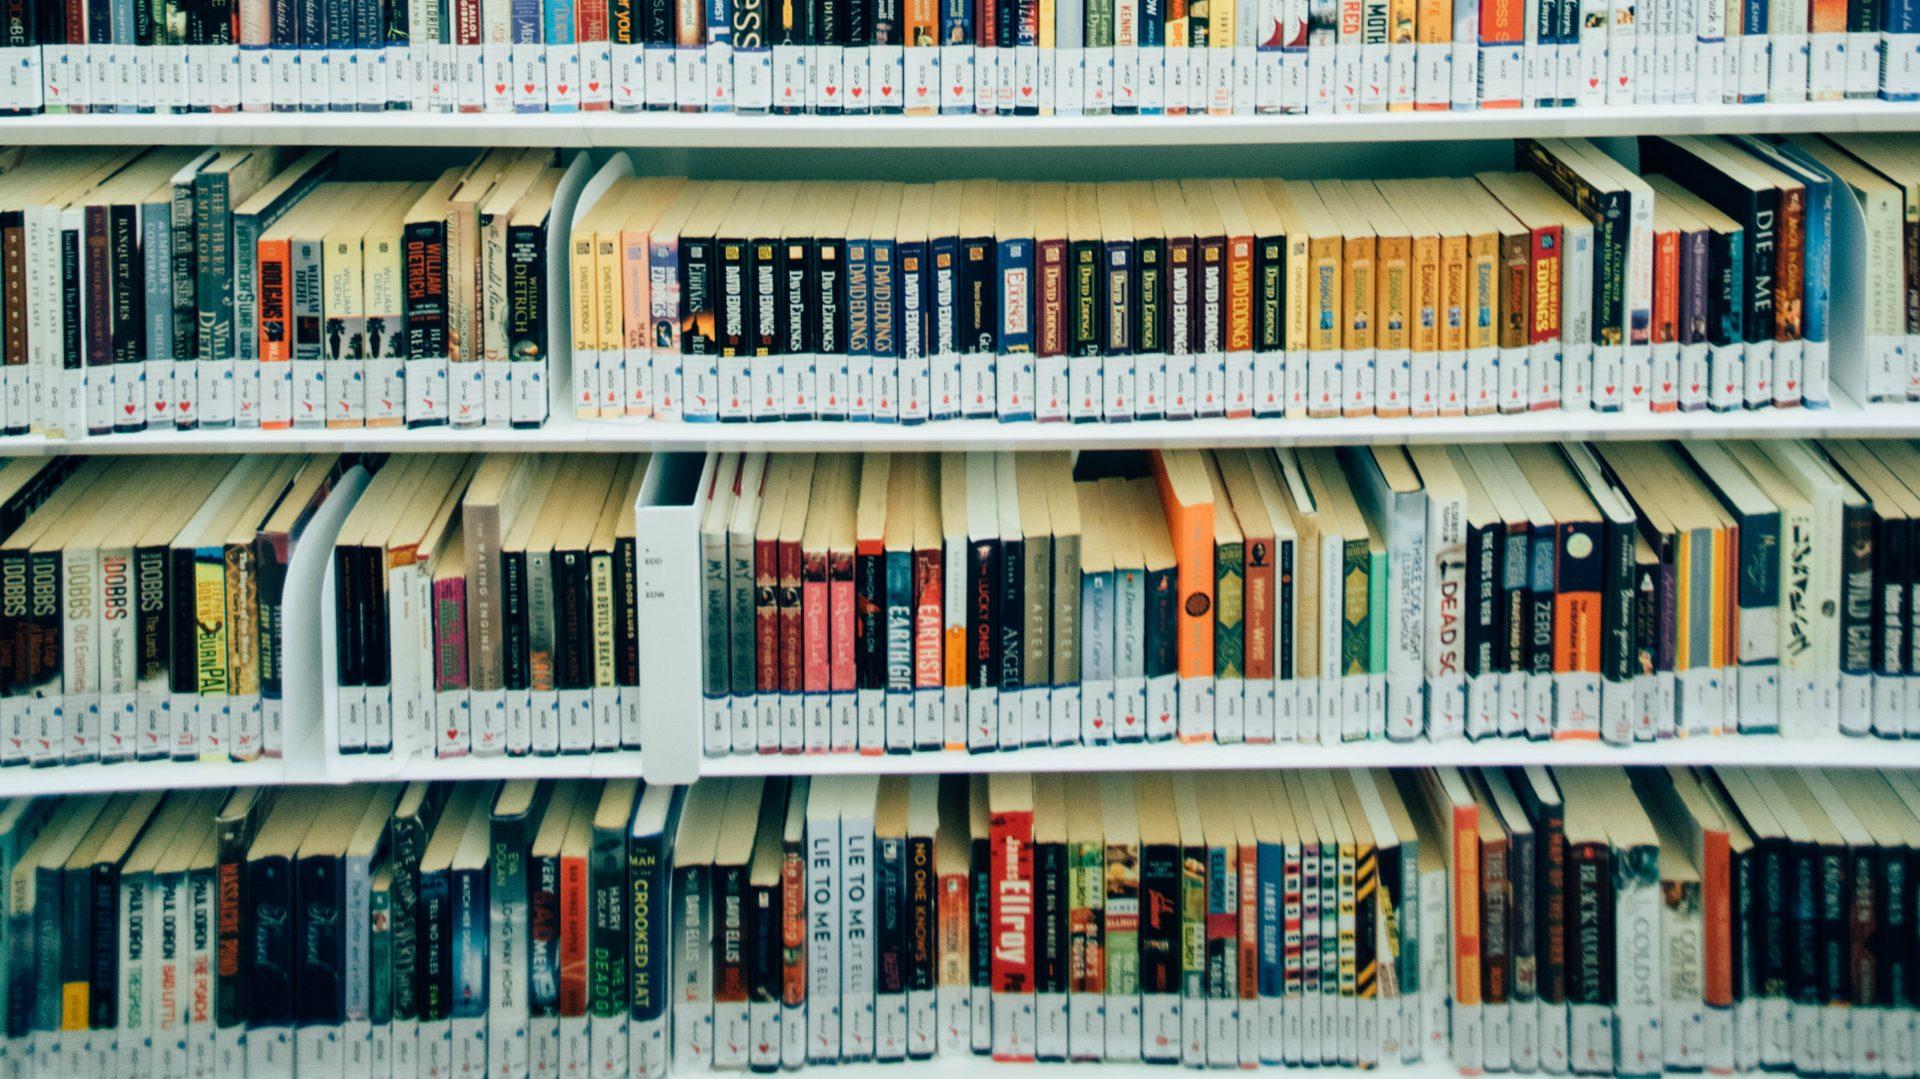 Northeast Georgia Regional Library System